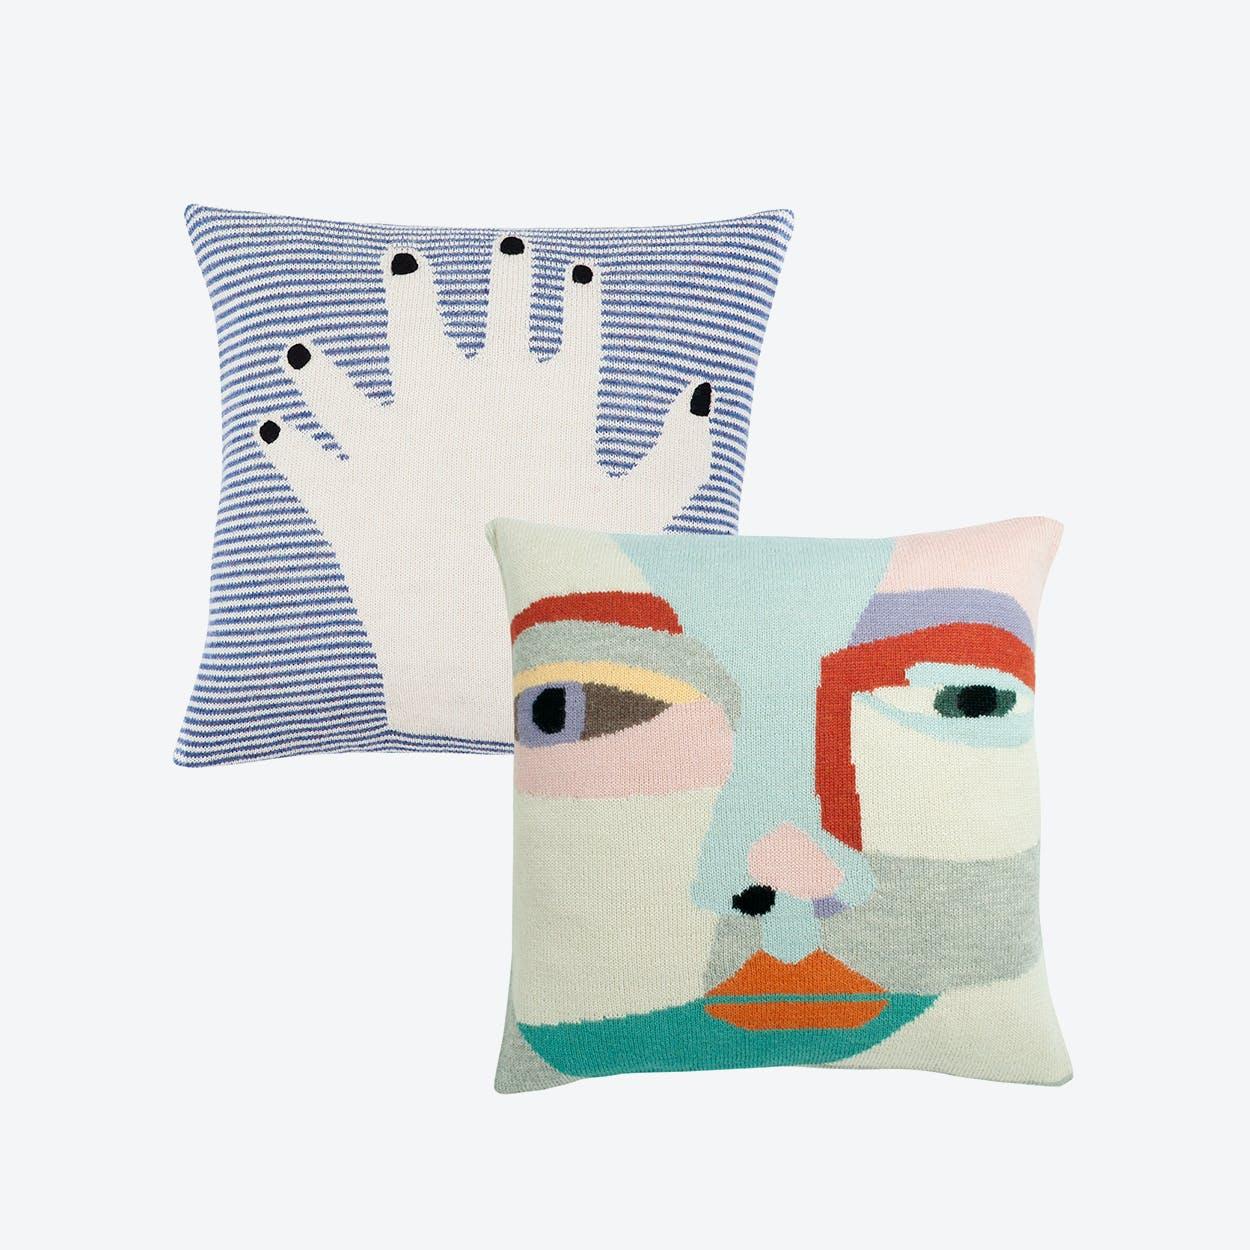 Fancy Finger Blue & Face it Cushion Case (Set of 2)